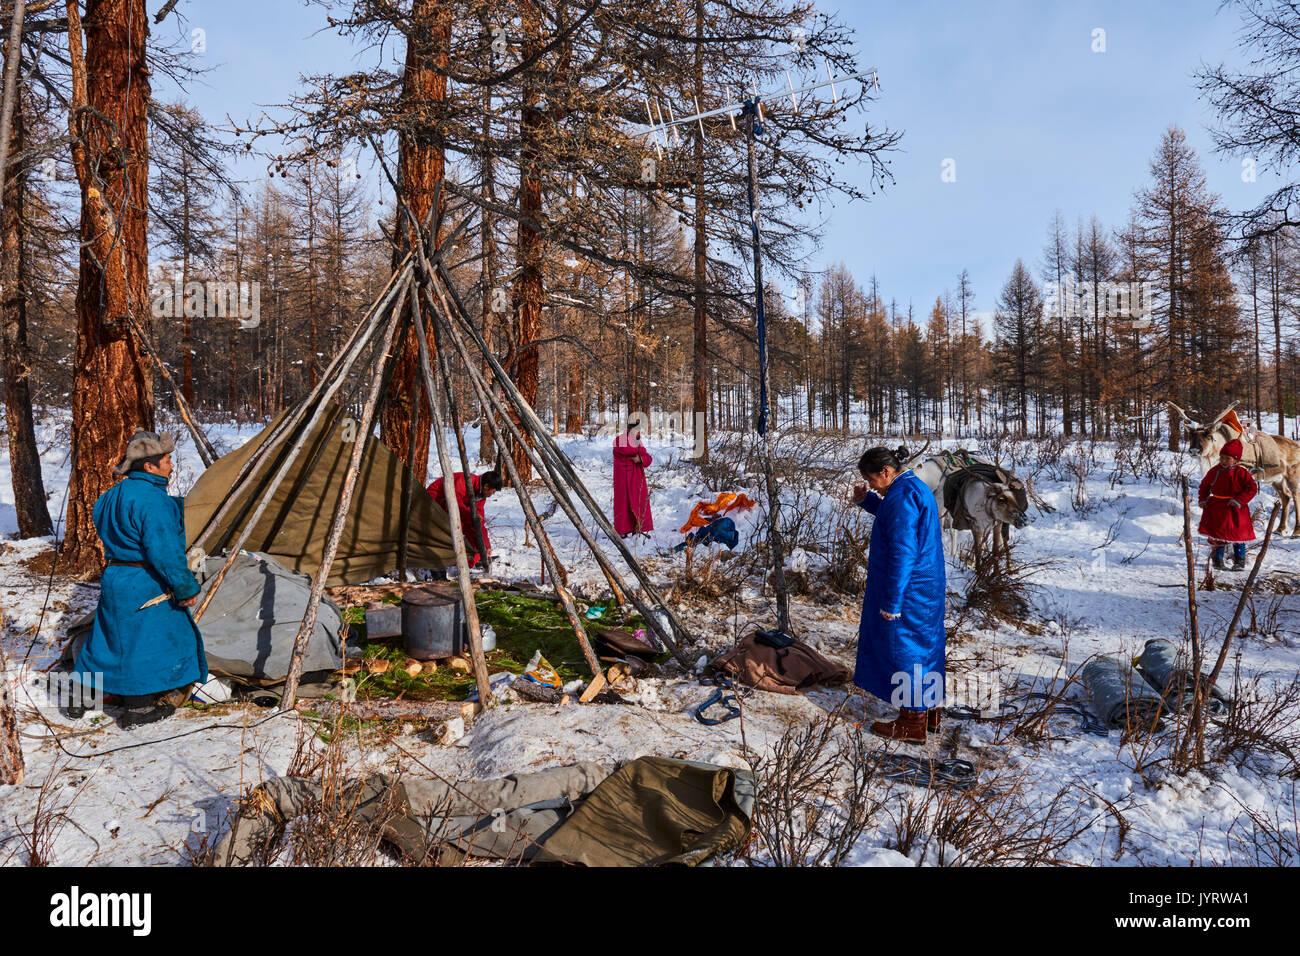 Mongolia, Khovsgol province, the Tsaatan, reindeer herder, the winter camp, Ganbat's family is preparing the winter transhumance - Stock Image